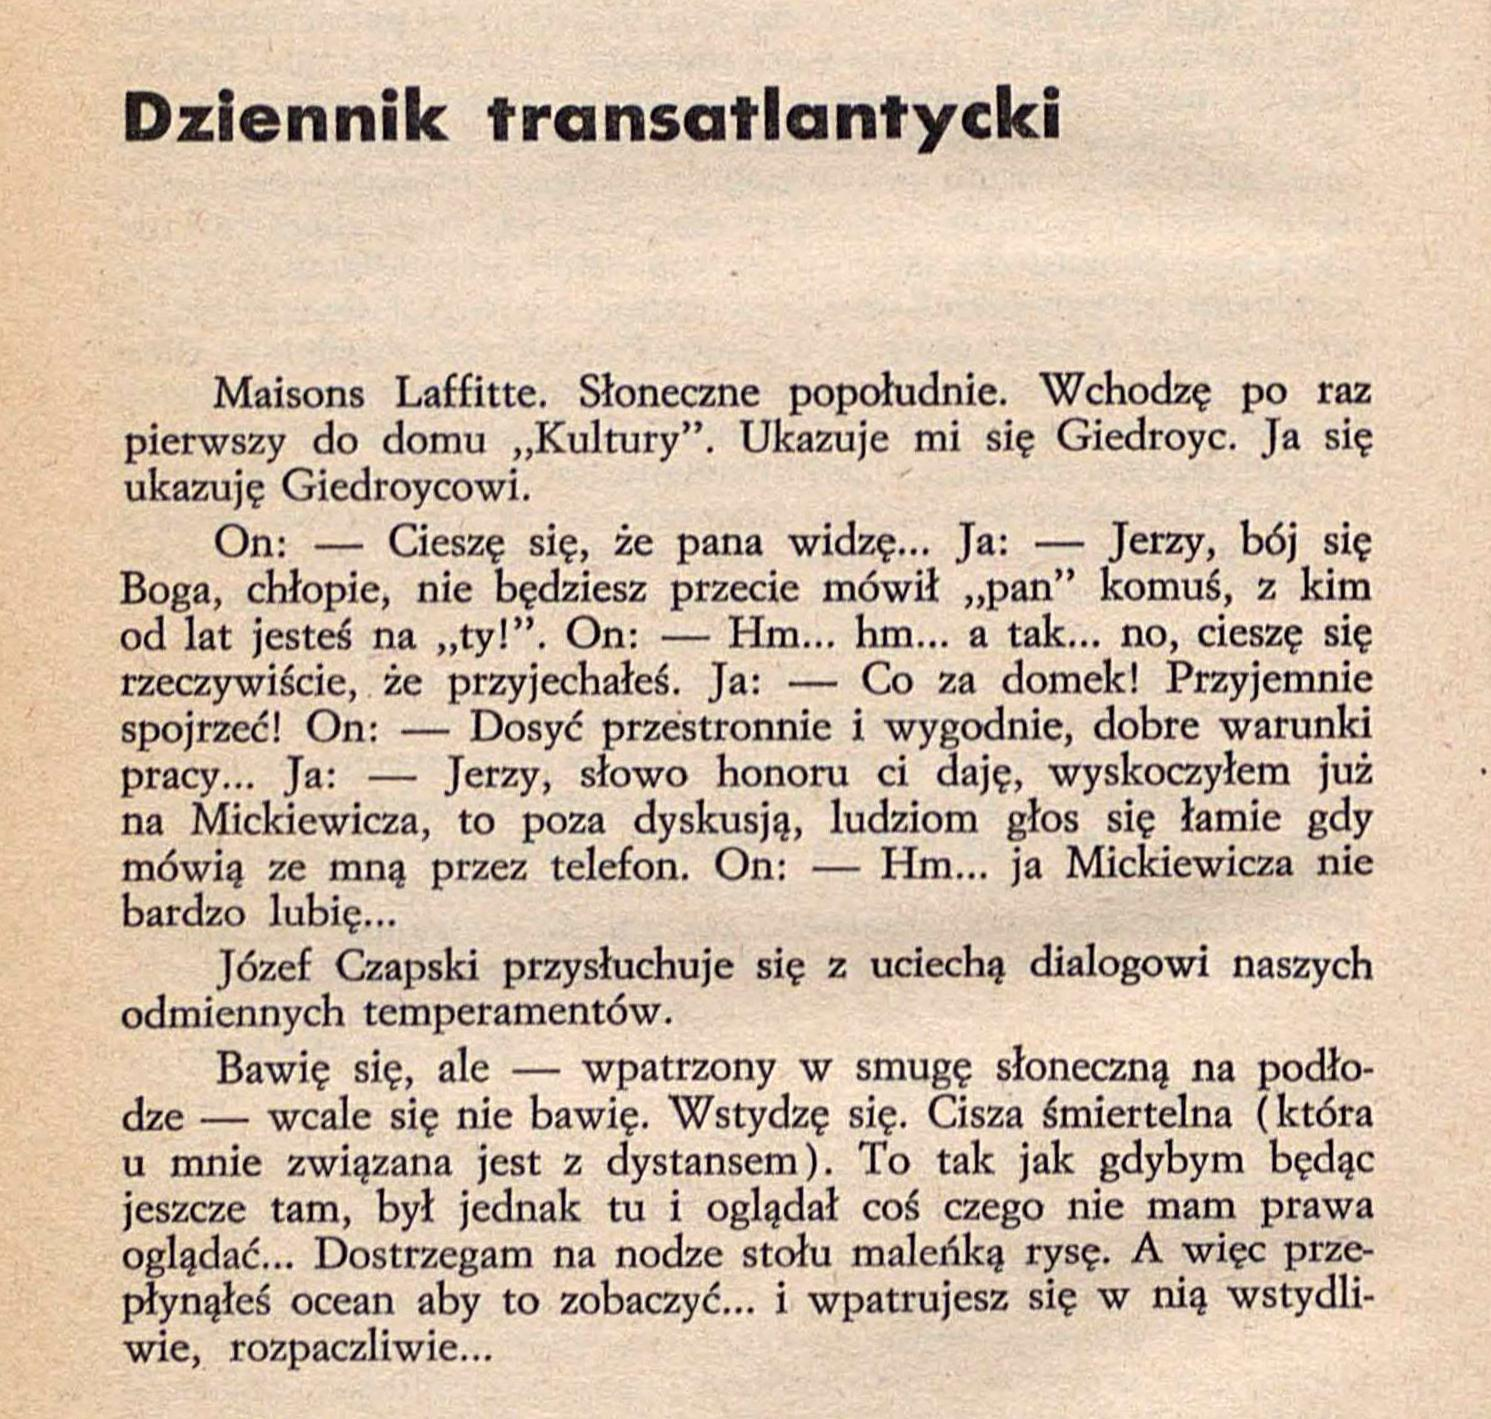 "<div class='inner-box'><div class='close-desc'></div><span class='opis'>Fragment ""Dziennika transatlantyckiego"" Witolda Gombrowicza. Pierwsze chwile w Maisons-Laffitte. ""Kultura"" nr 11/193, 1963 r., s. 24</span><div class='clearfix'></div><span>Cote du document sm00033</span><div class='clearfix'></div><span>© Instytut Literacki</span></div>"